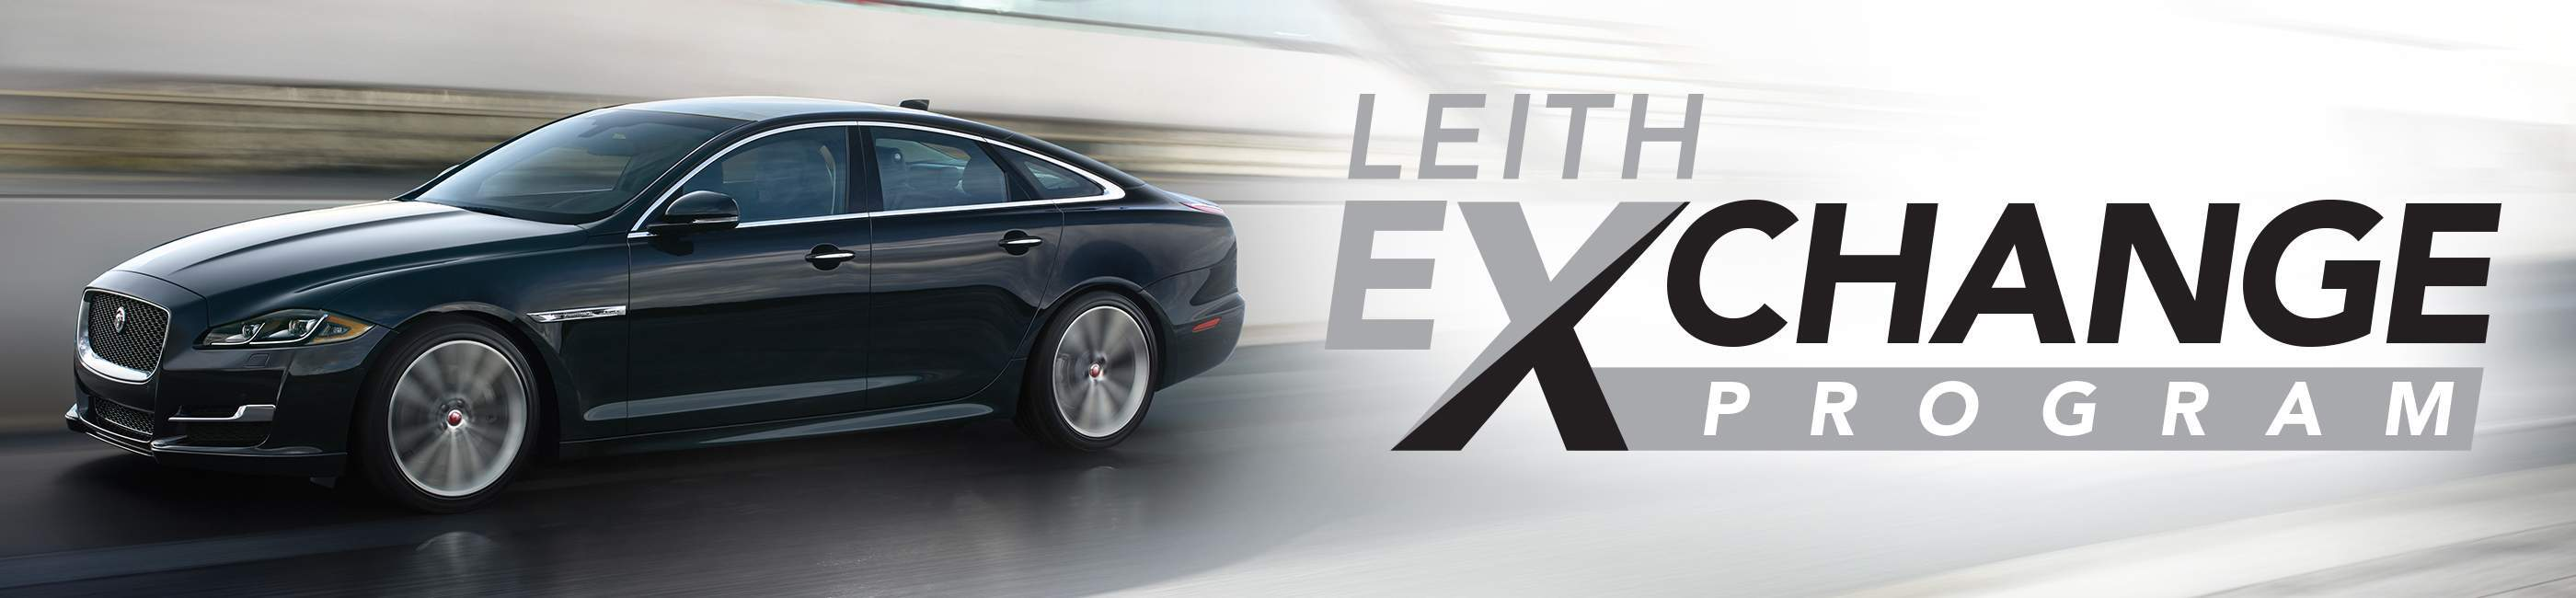 Leith Exchange Program